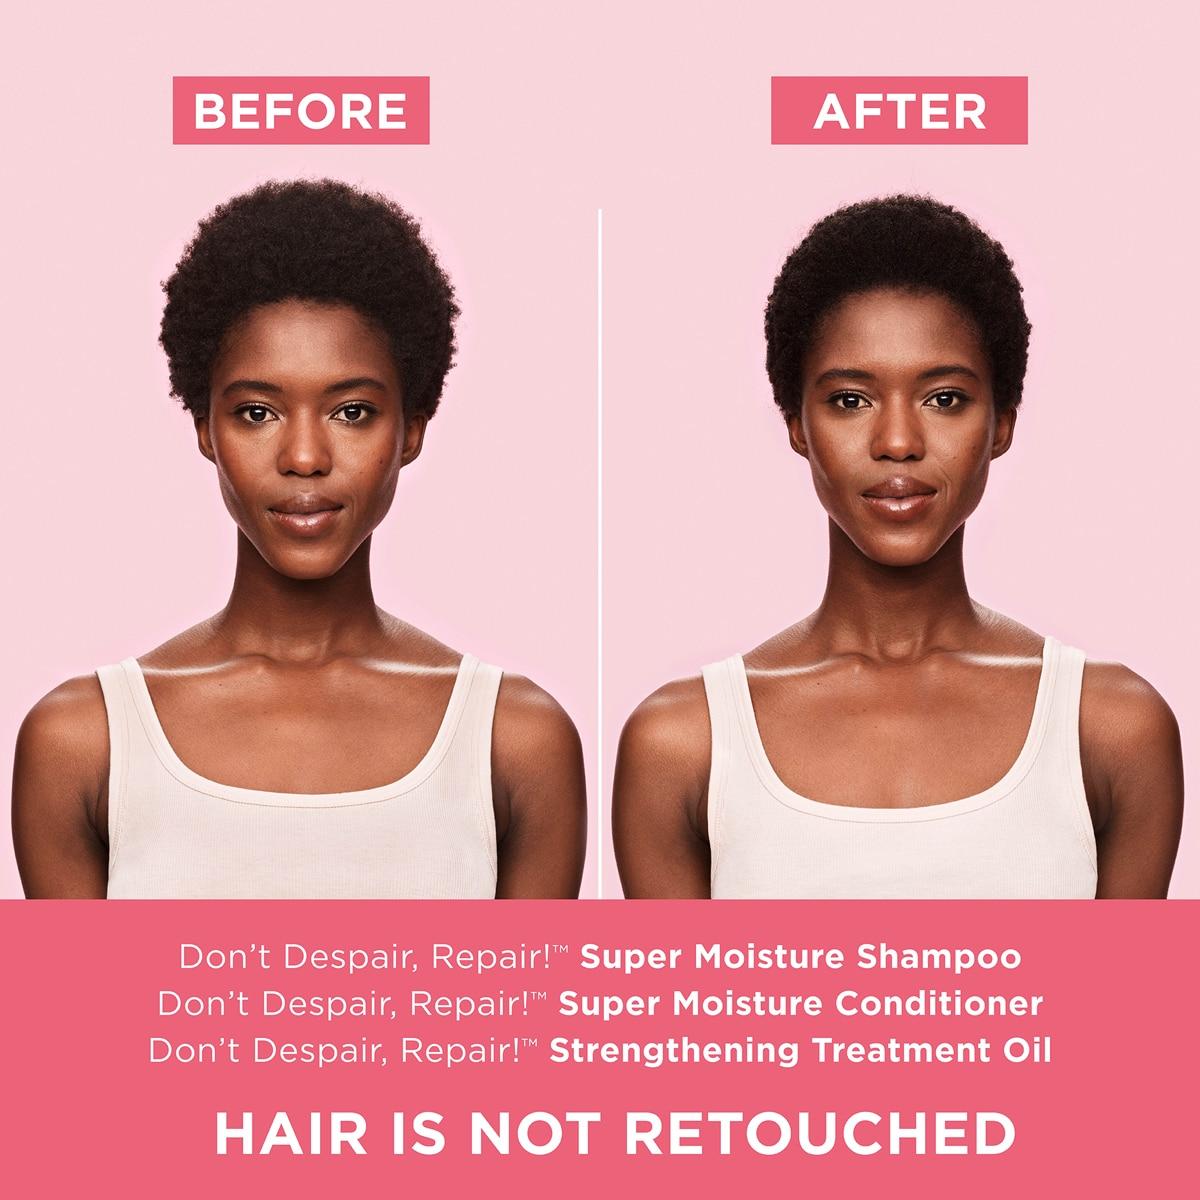 DON'T DESPAIR, REPAIR!™ SUPER MOISTURE CONDITIONER FOR DRY + DAMAGED HAIR